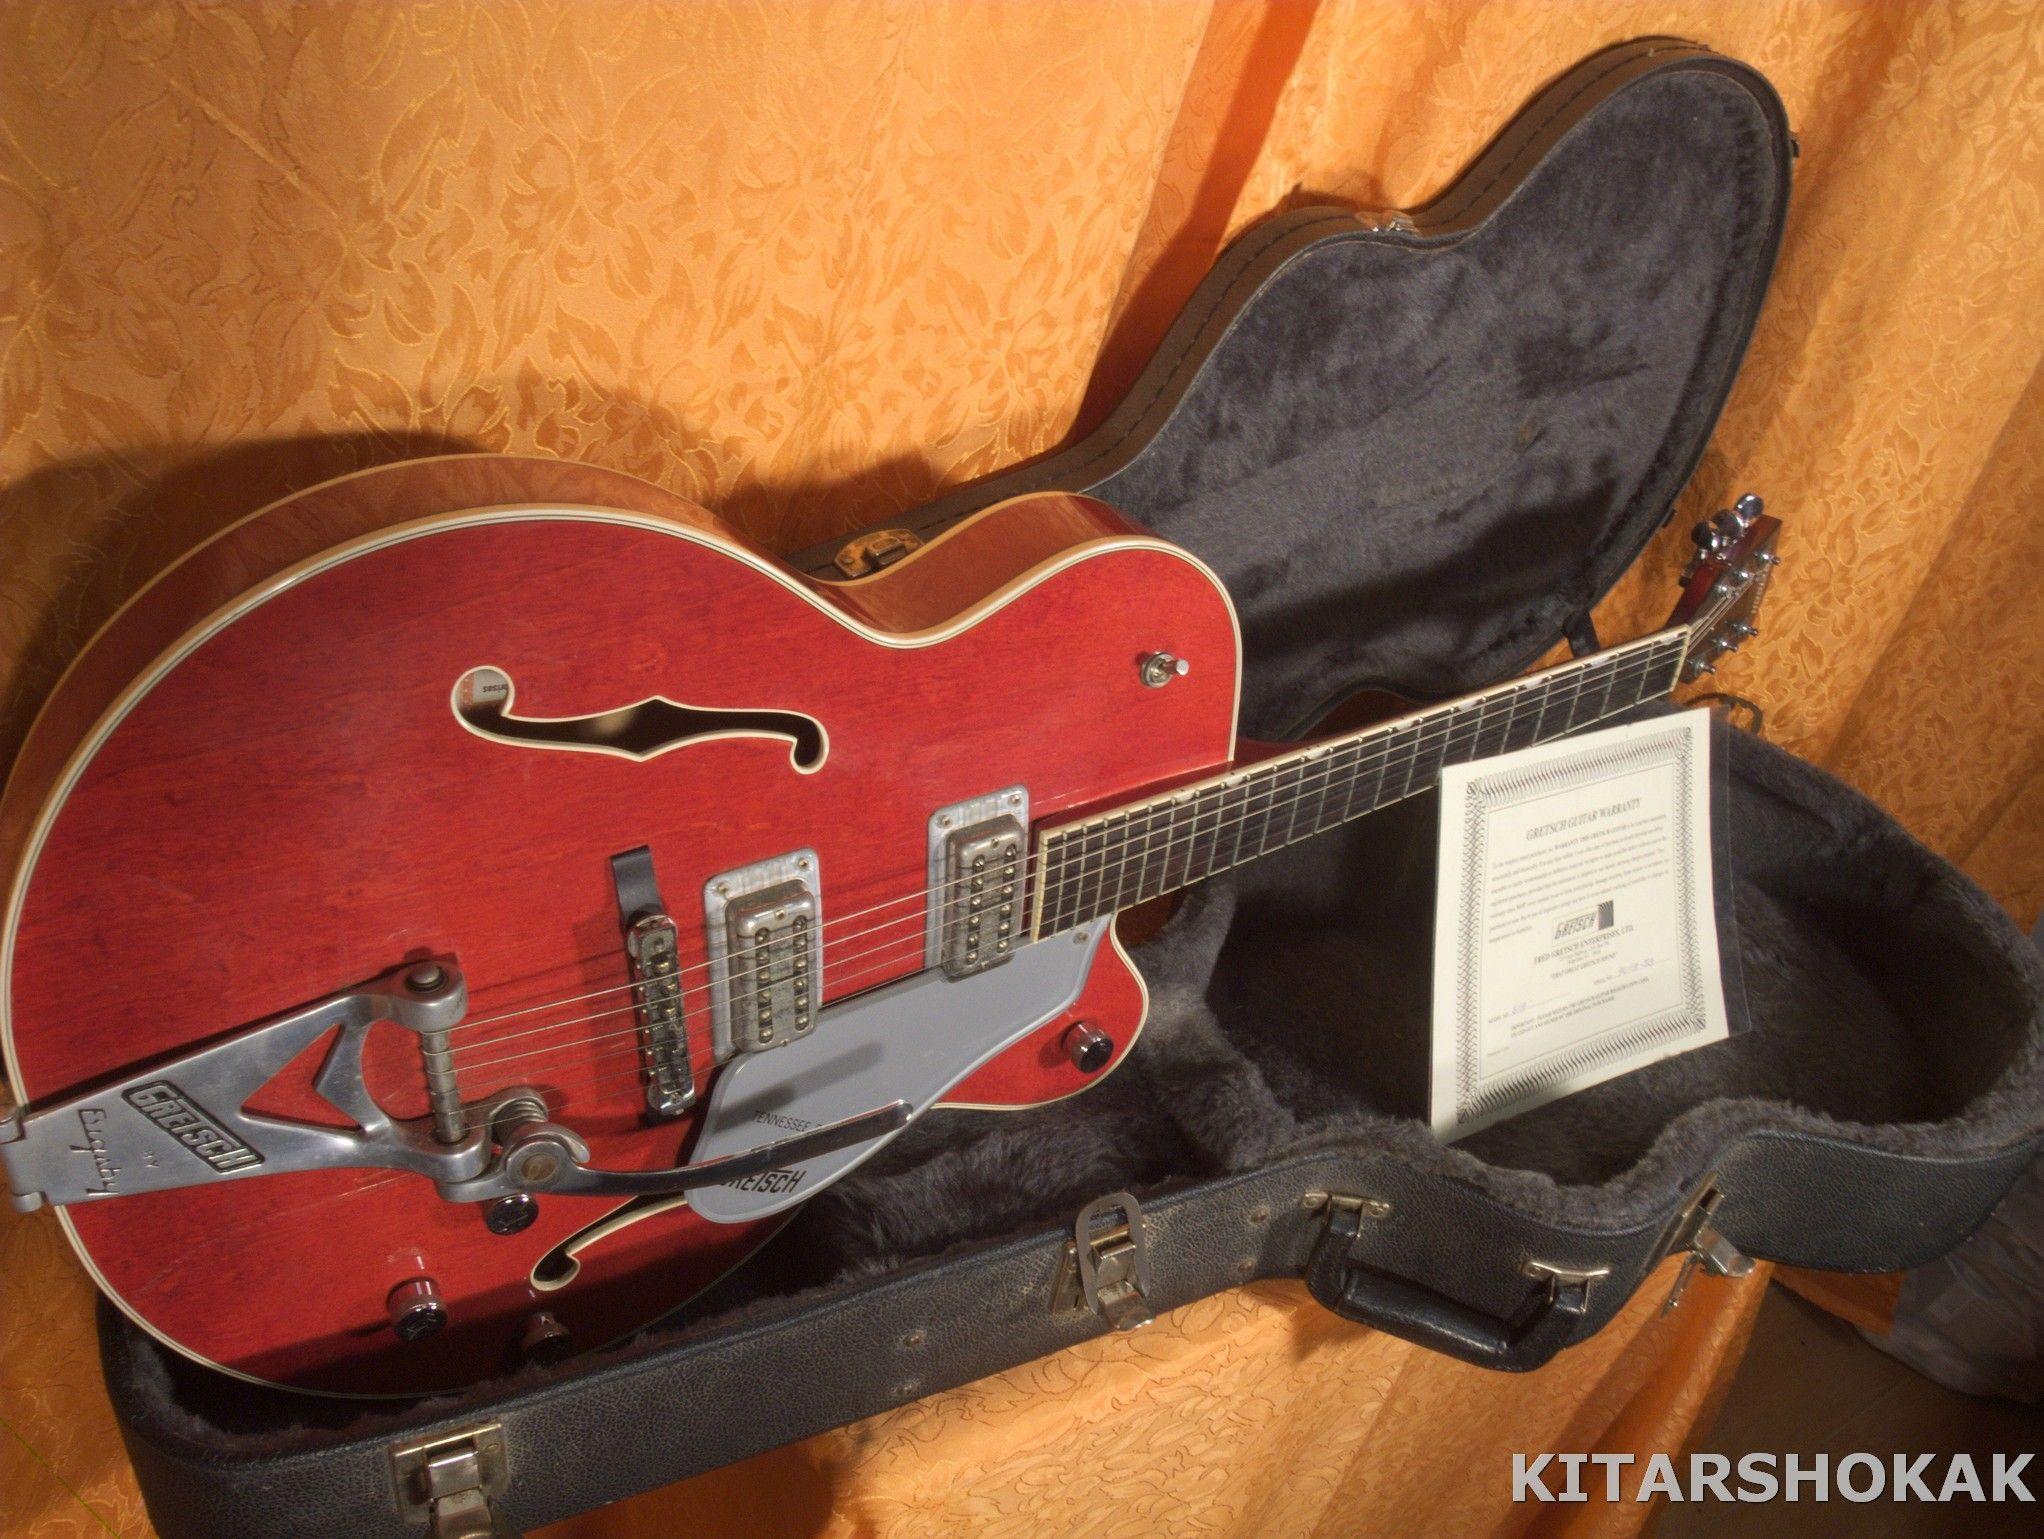 Gretsch 6119 Tennessee Rose Chet Atkins Pre Fender 1990 Year Venta Cambio Salgai Aldatzeko Sale Trade 1675 Gretsch Instrumentos Musicales Compra Venta